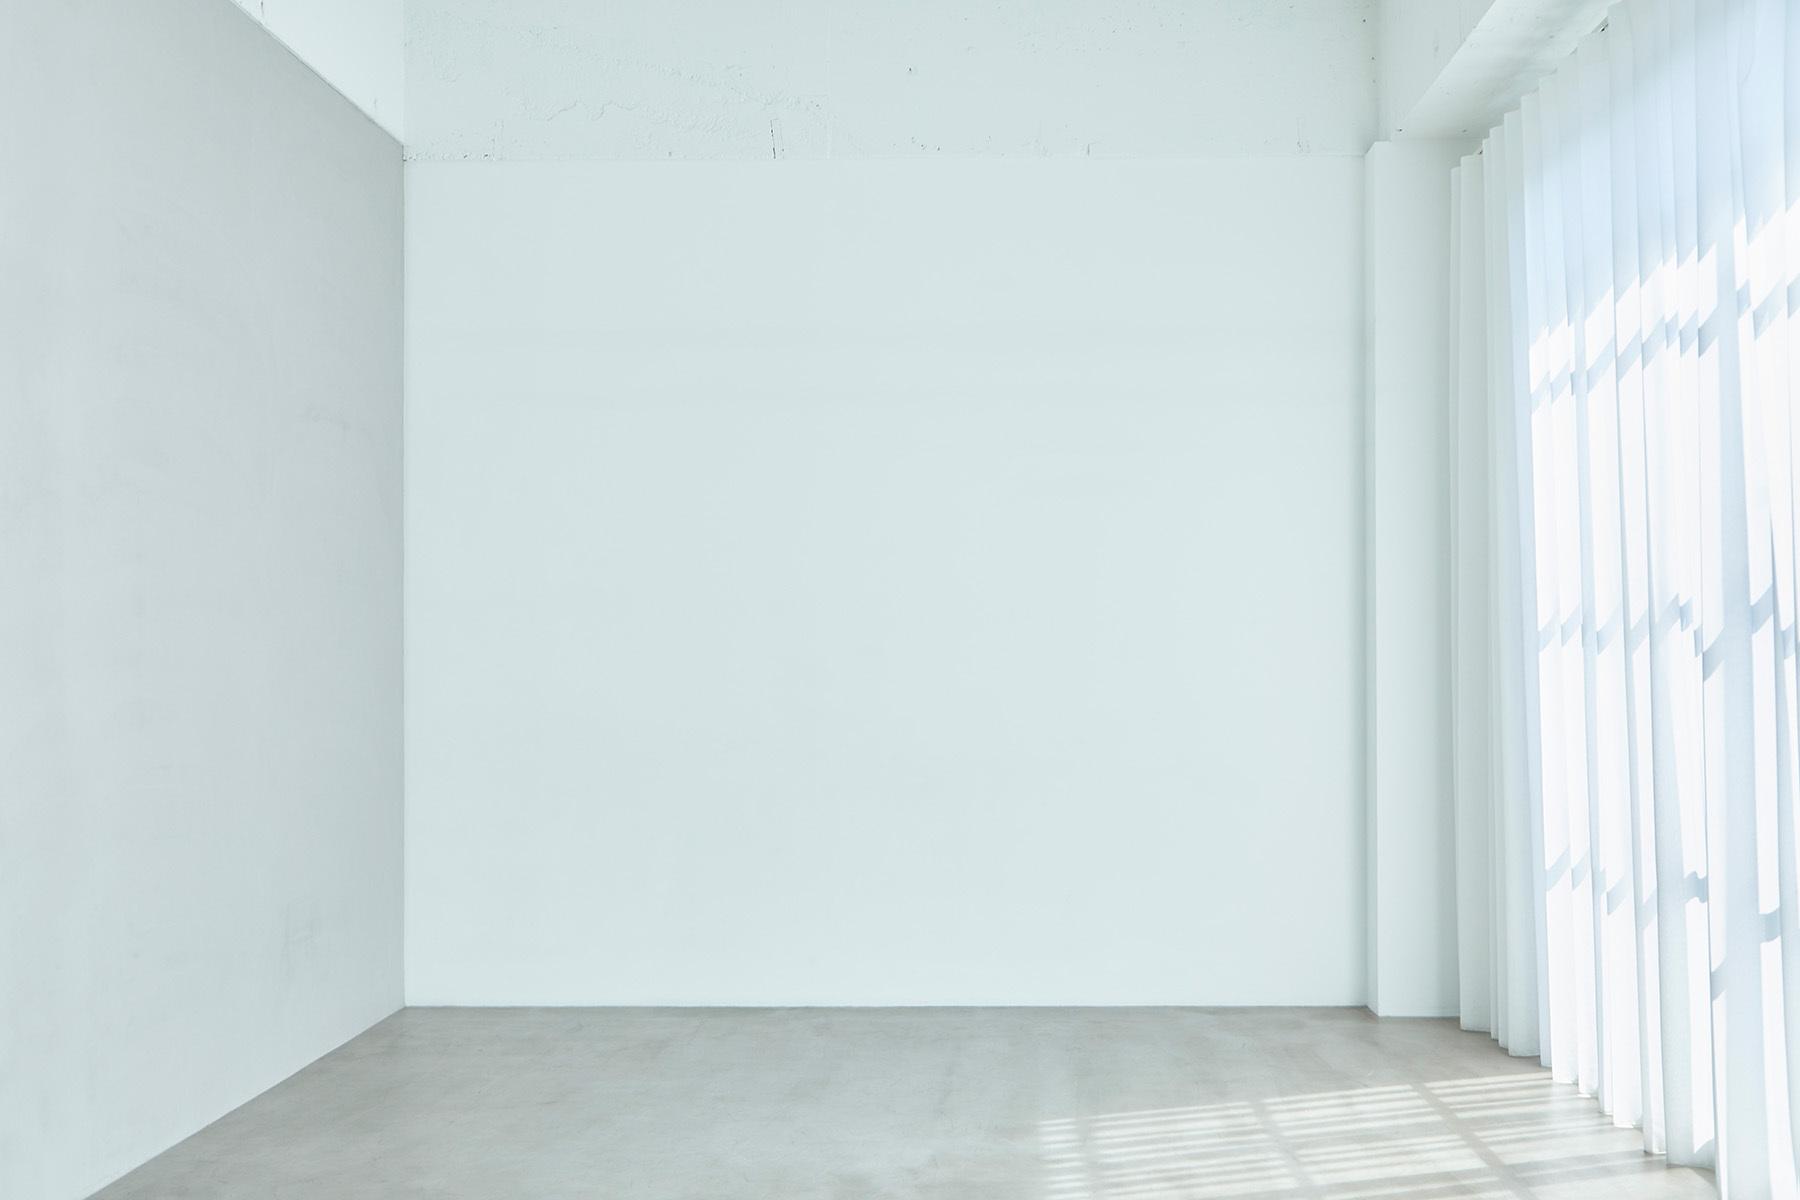 AtelierSix Studio&Prop (アトリエシックス)普遍的モルタル床×白壁